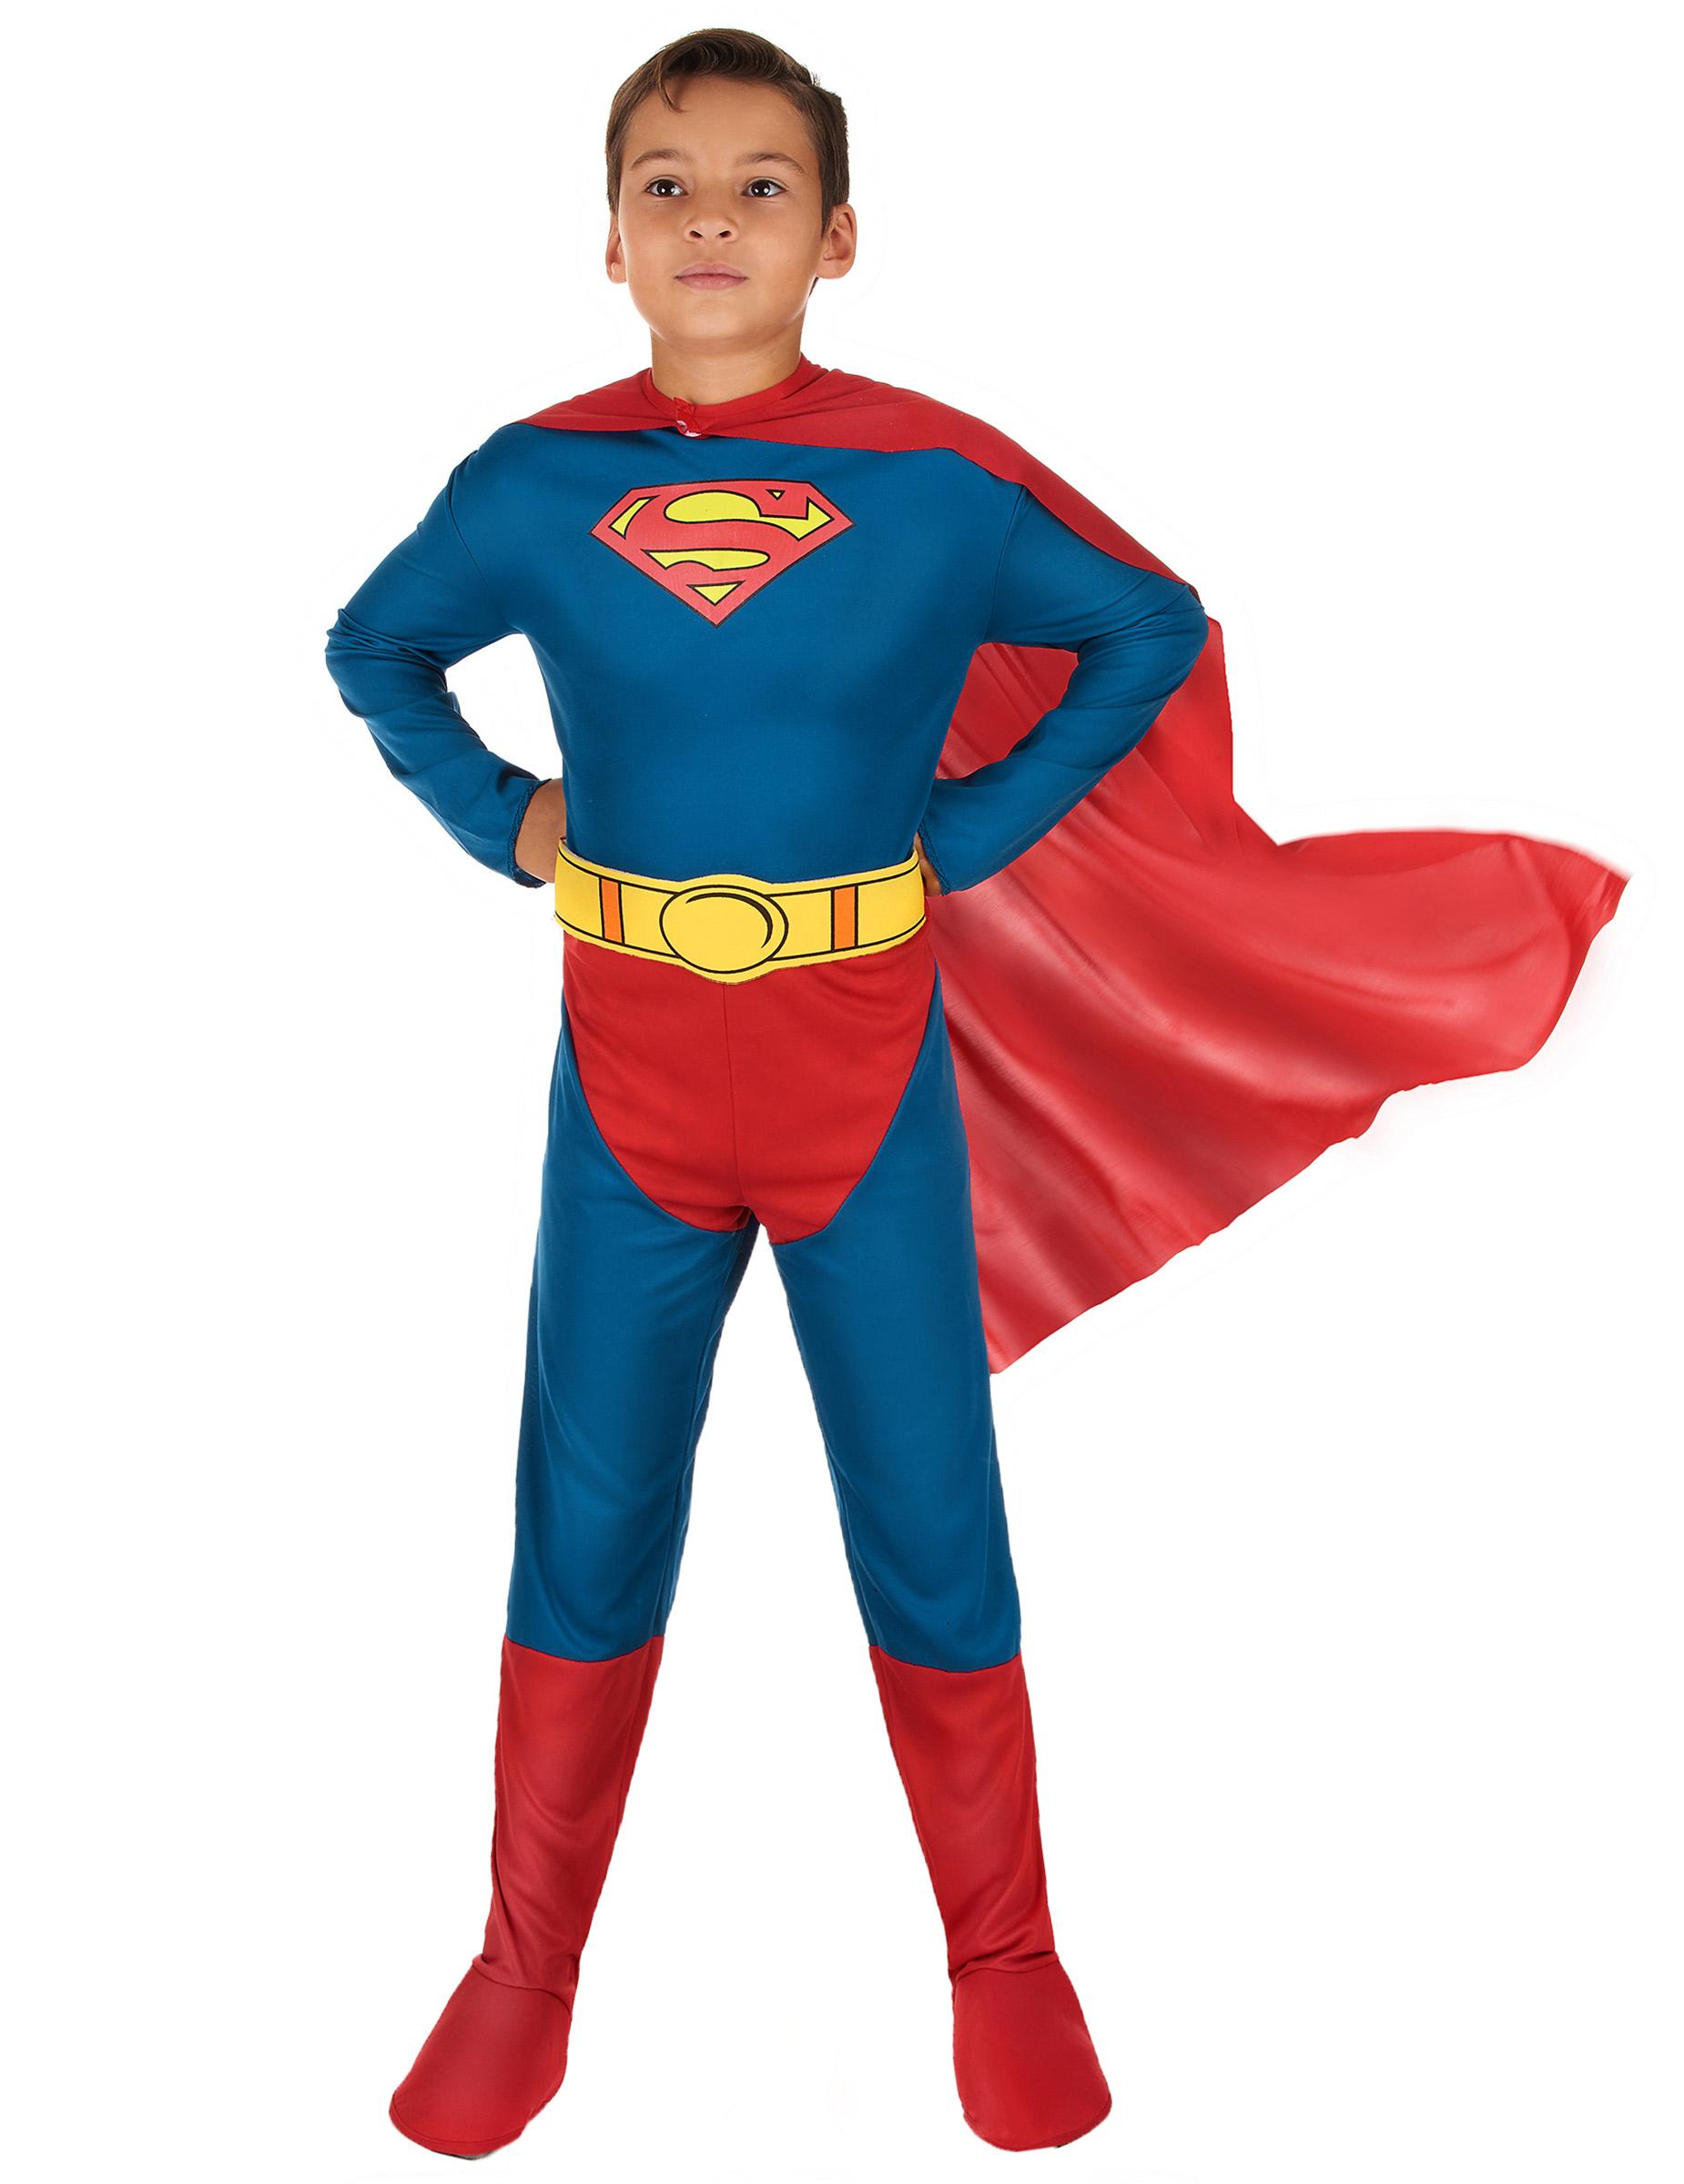 superman kinderkost m lizenzware blau rot gelb g nstige faschings kost me bei karneval megastore. Black Bedroom Furniture Sets. Home Design Ideas